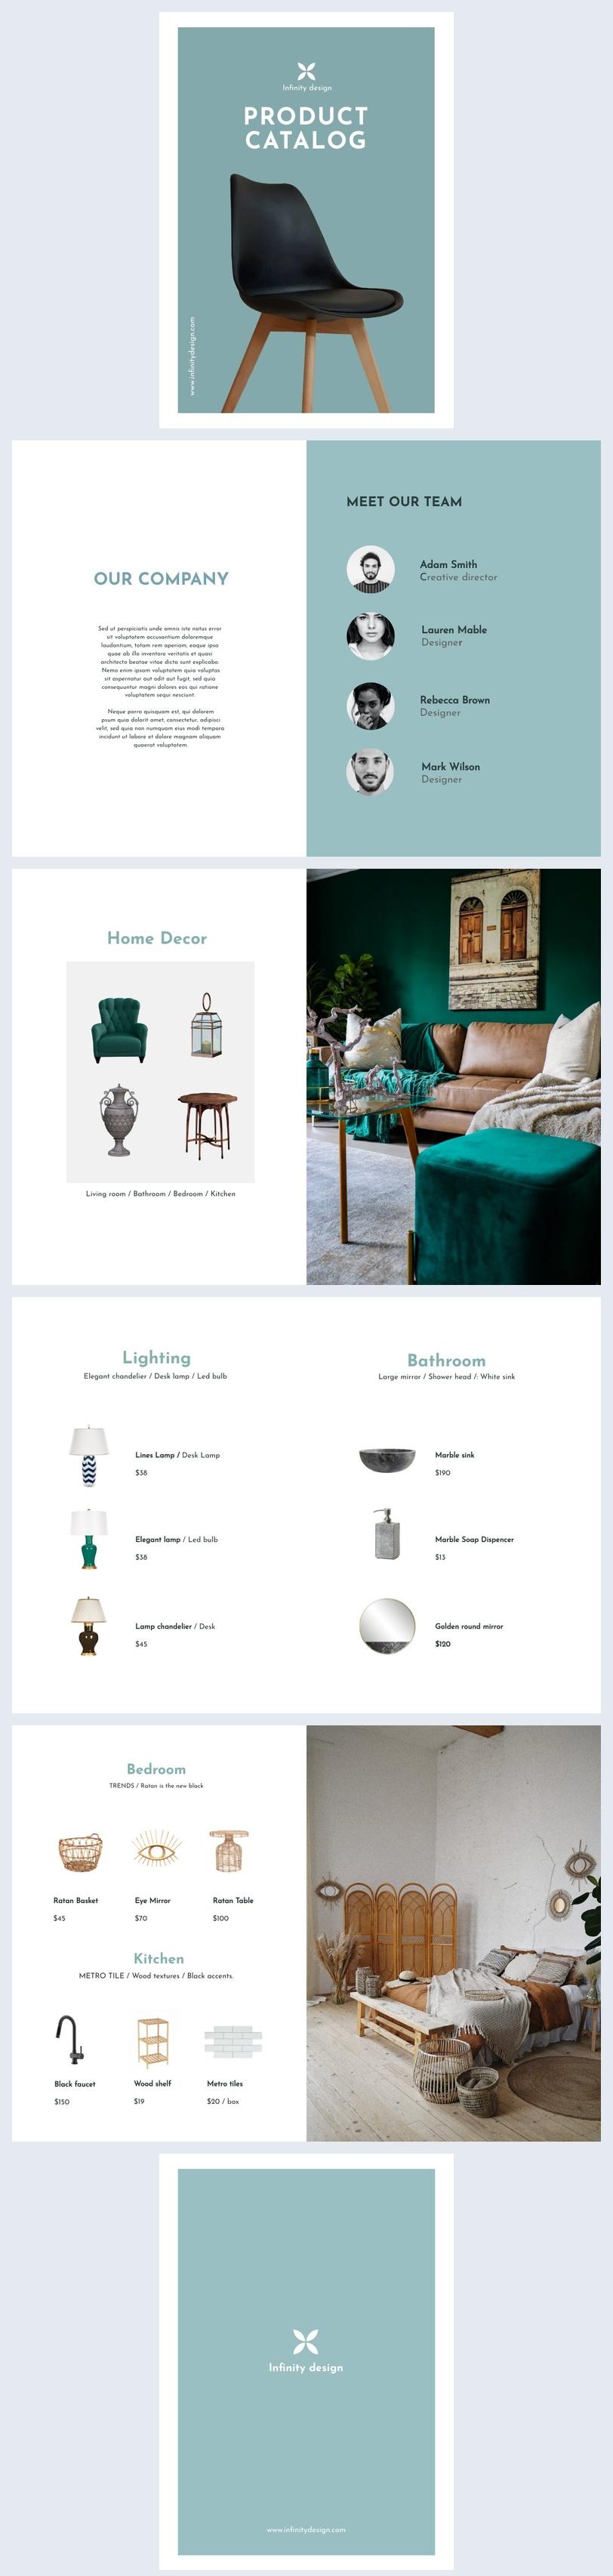 Product Catalog Design Example Idea